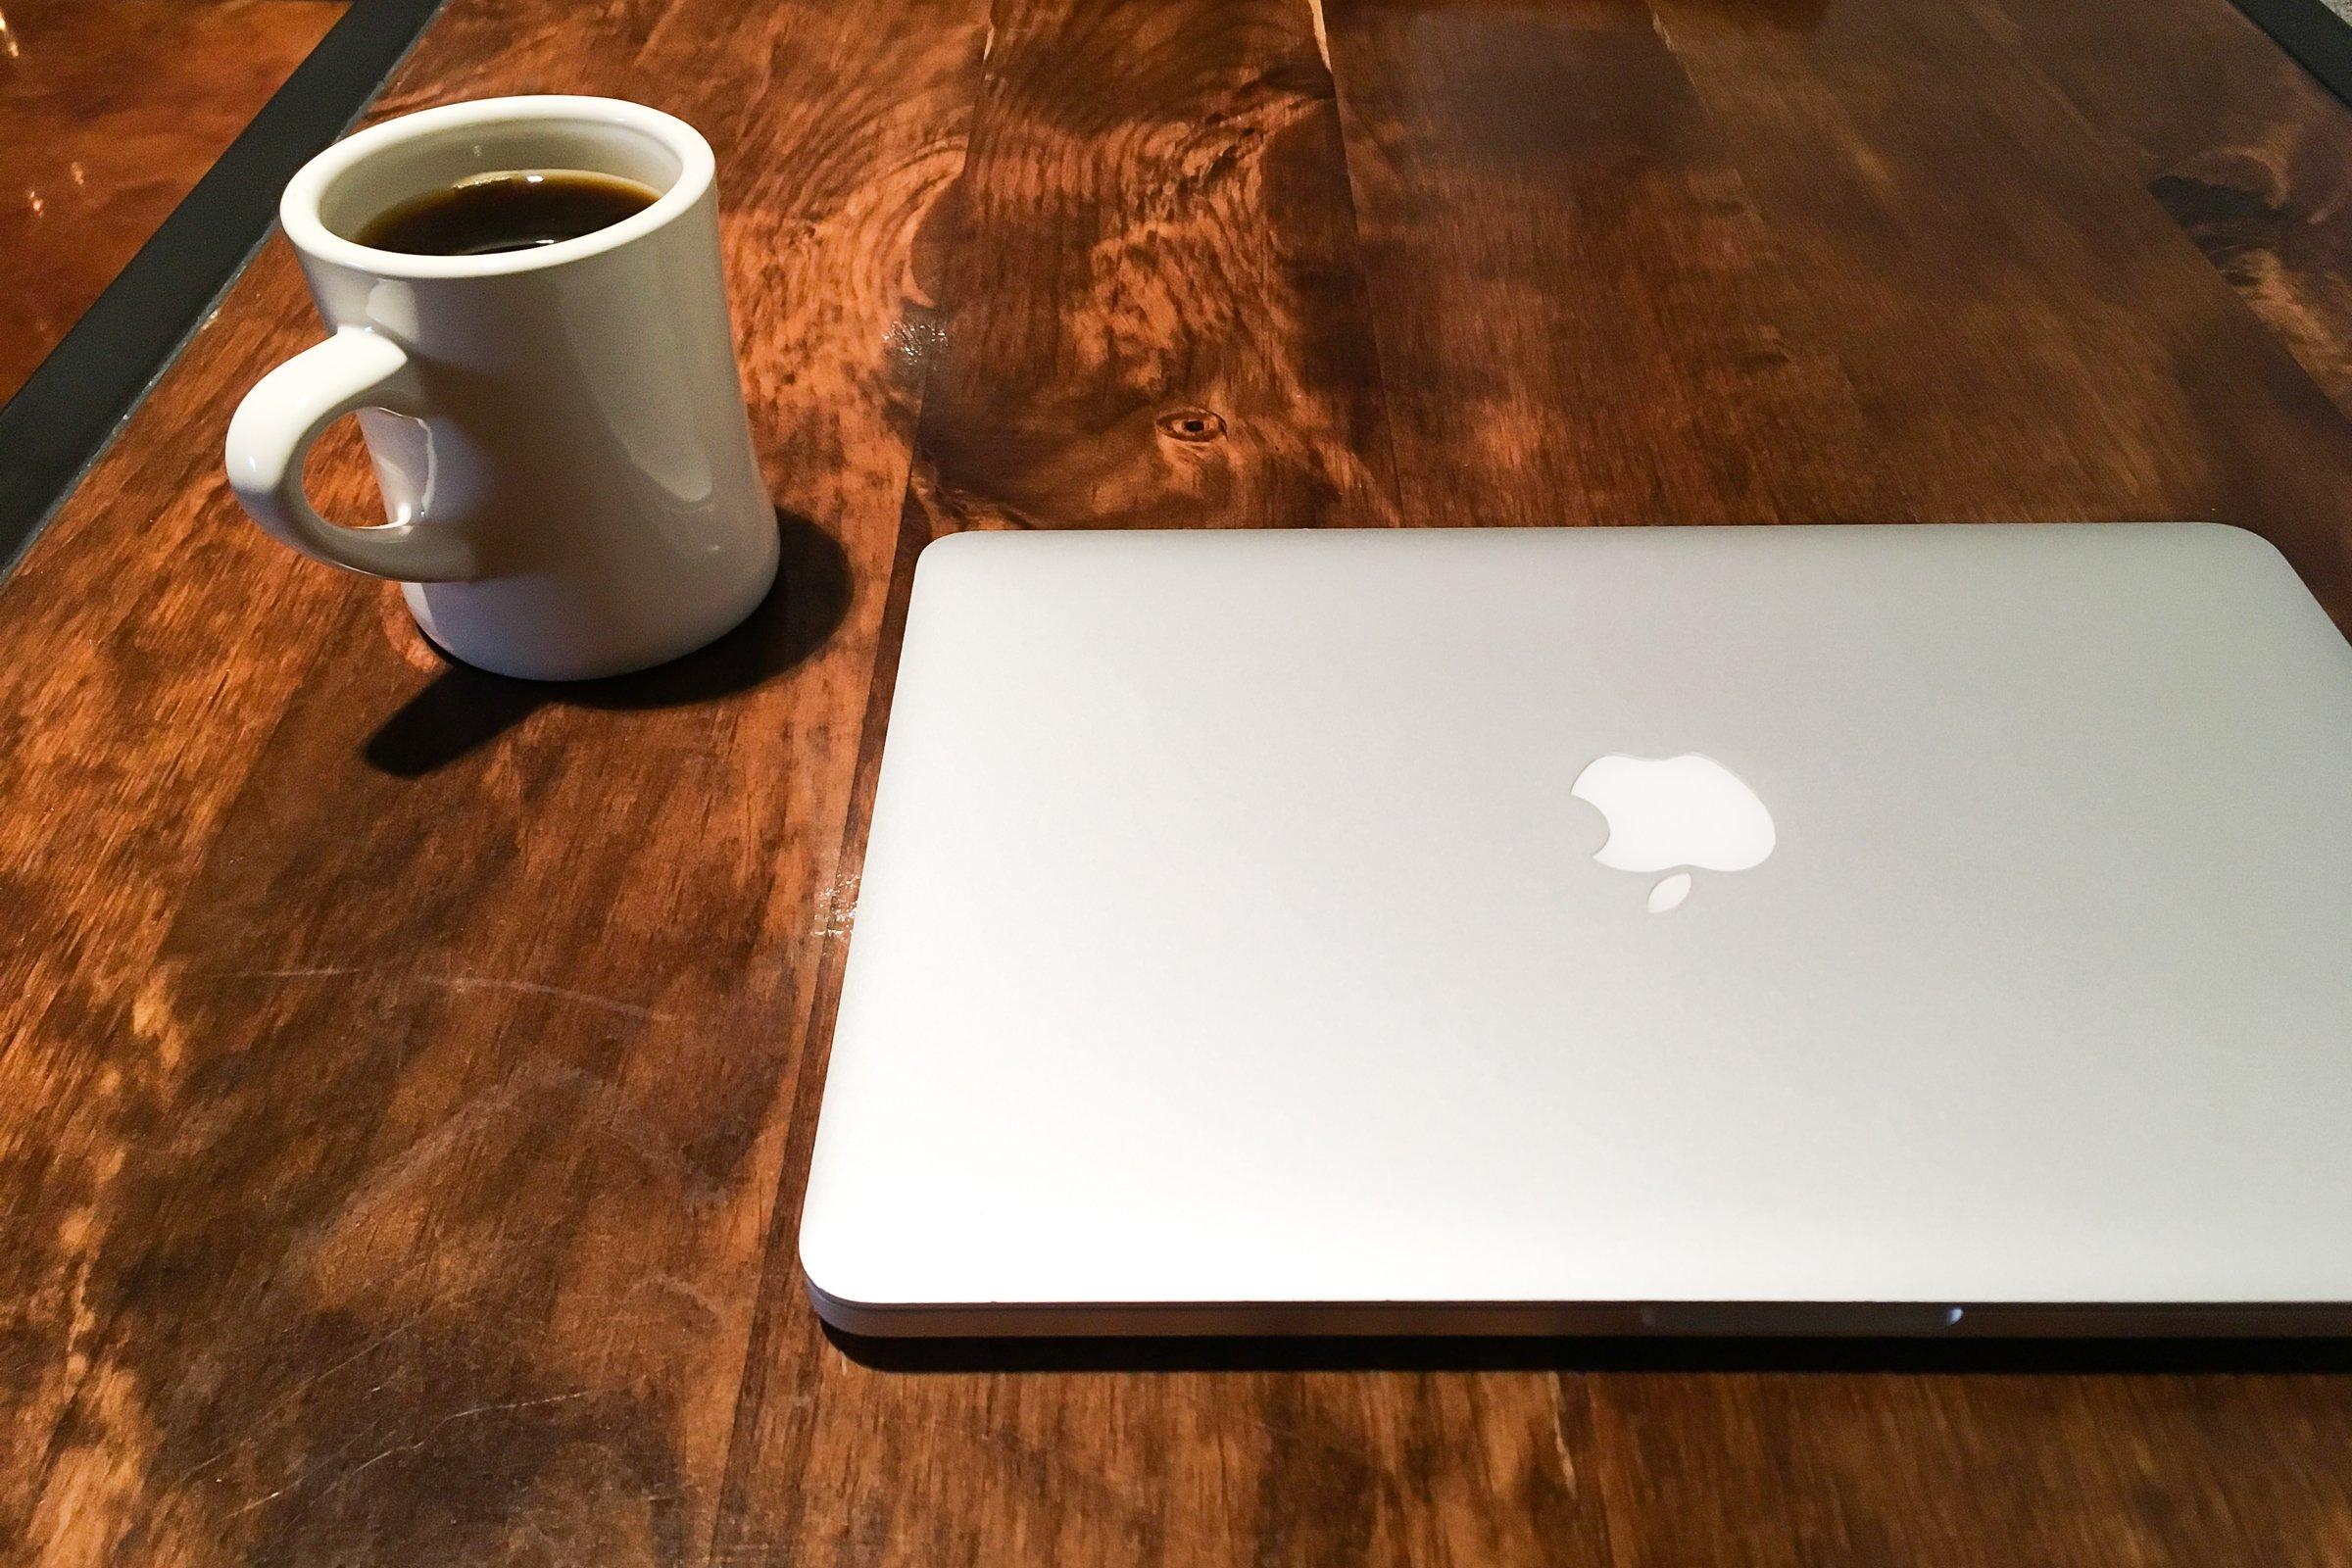 Coffee Cup & Macbook Laptop